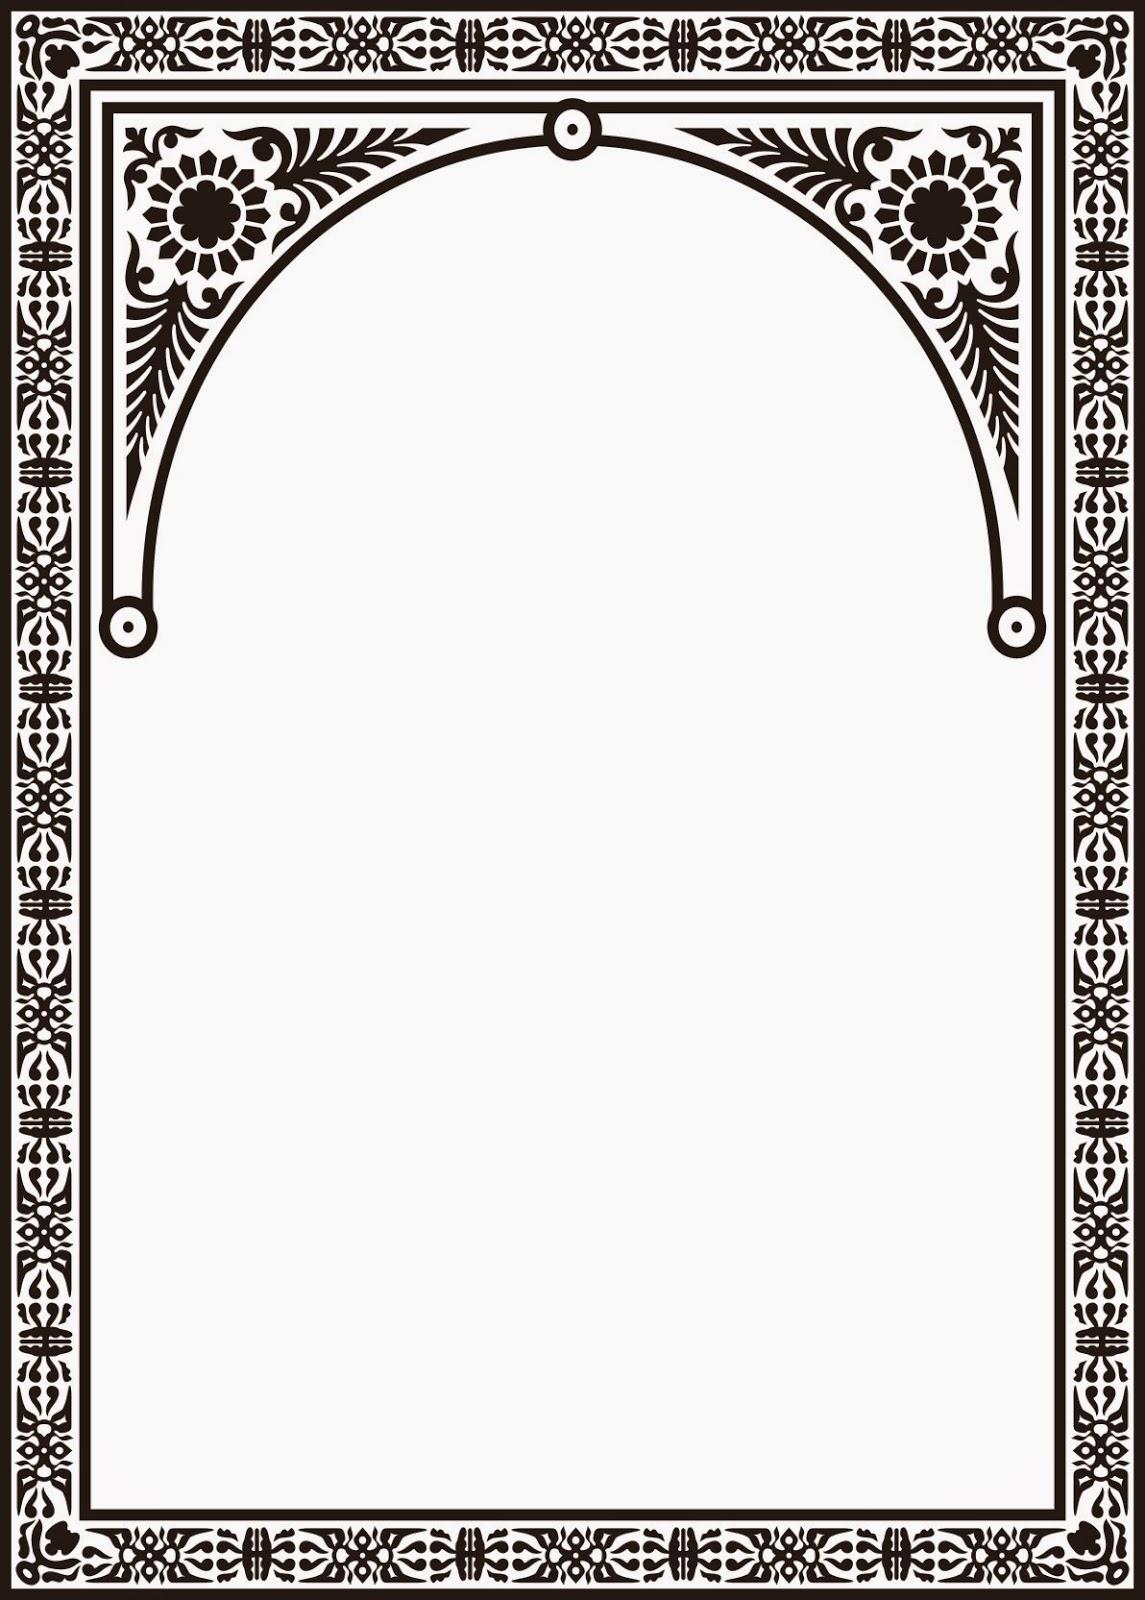 Bingkai Yasin Vector : bingkai, yasin, vector, Frame, Kaligrafi, Vector, Islami, 💕💕